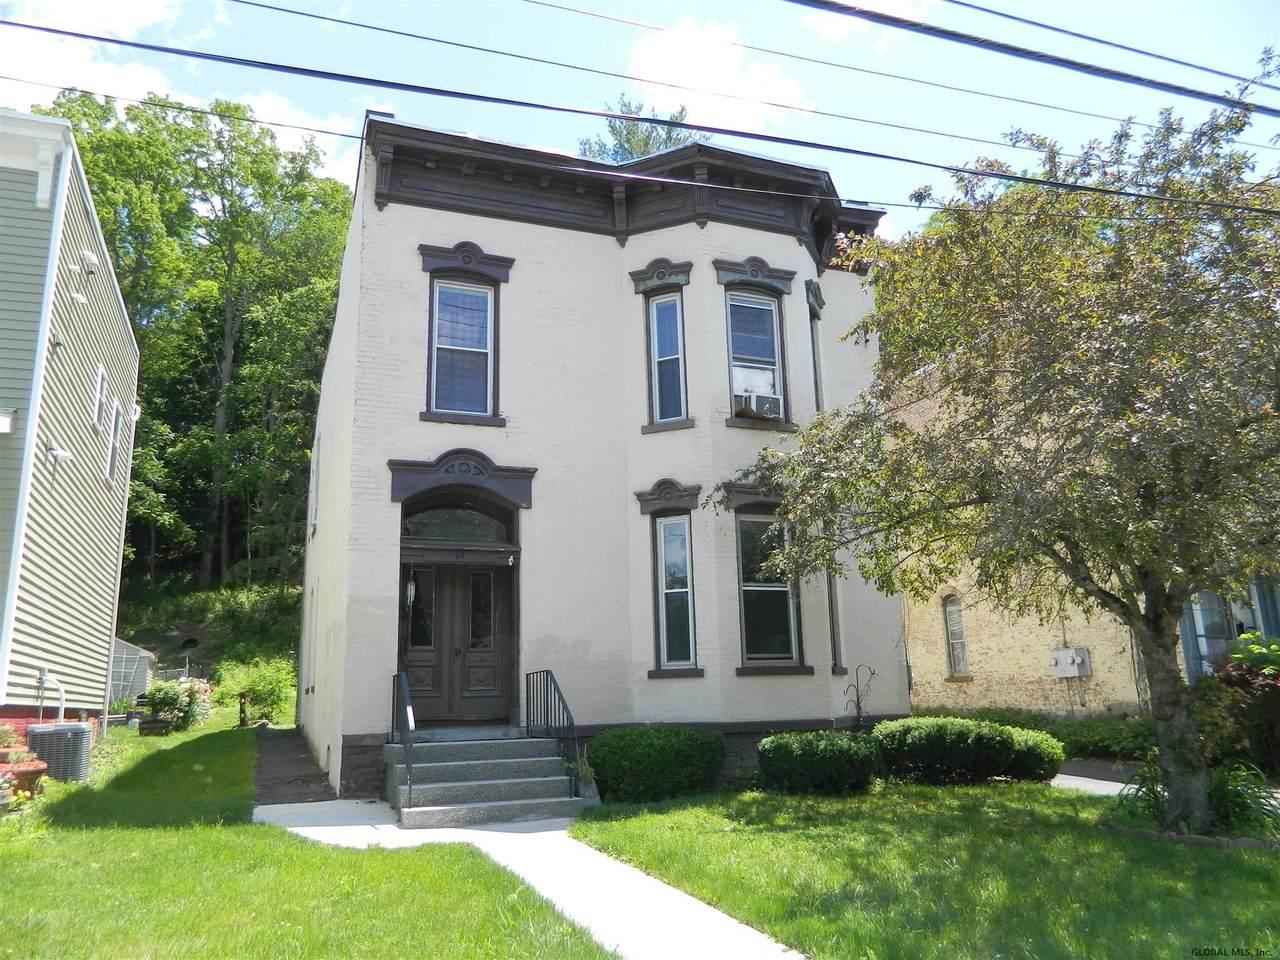 64 North Main St - Photo 1